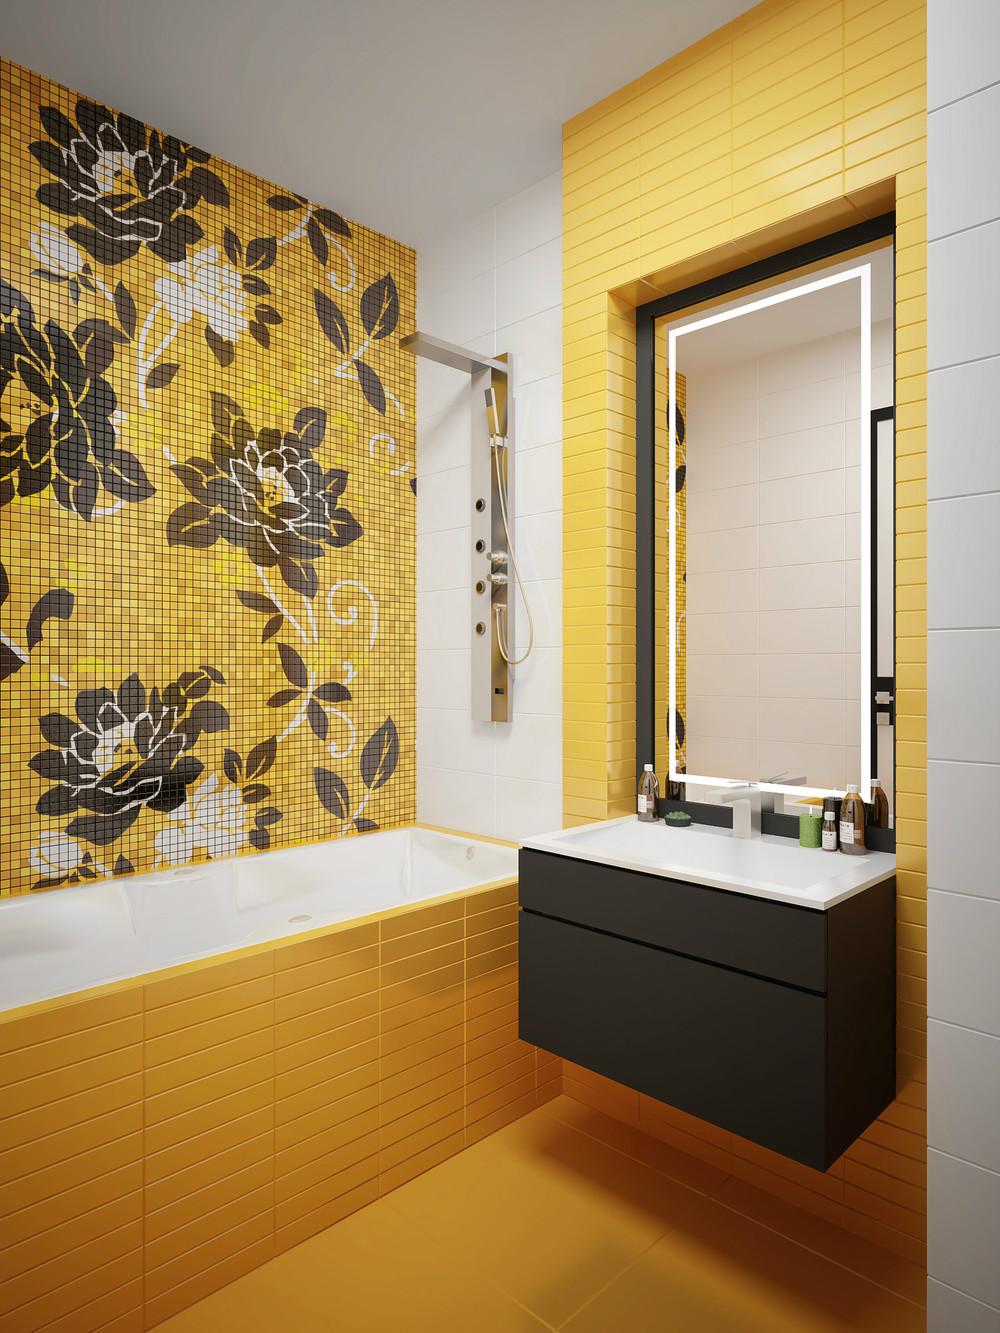 Желто-черно-белая маленькая ванная комната